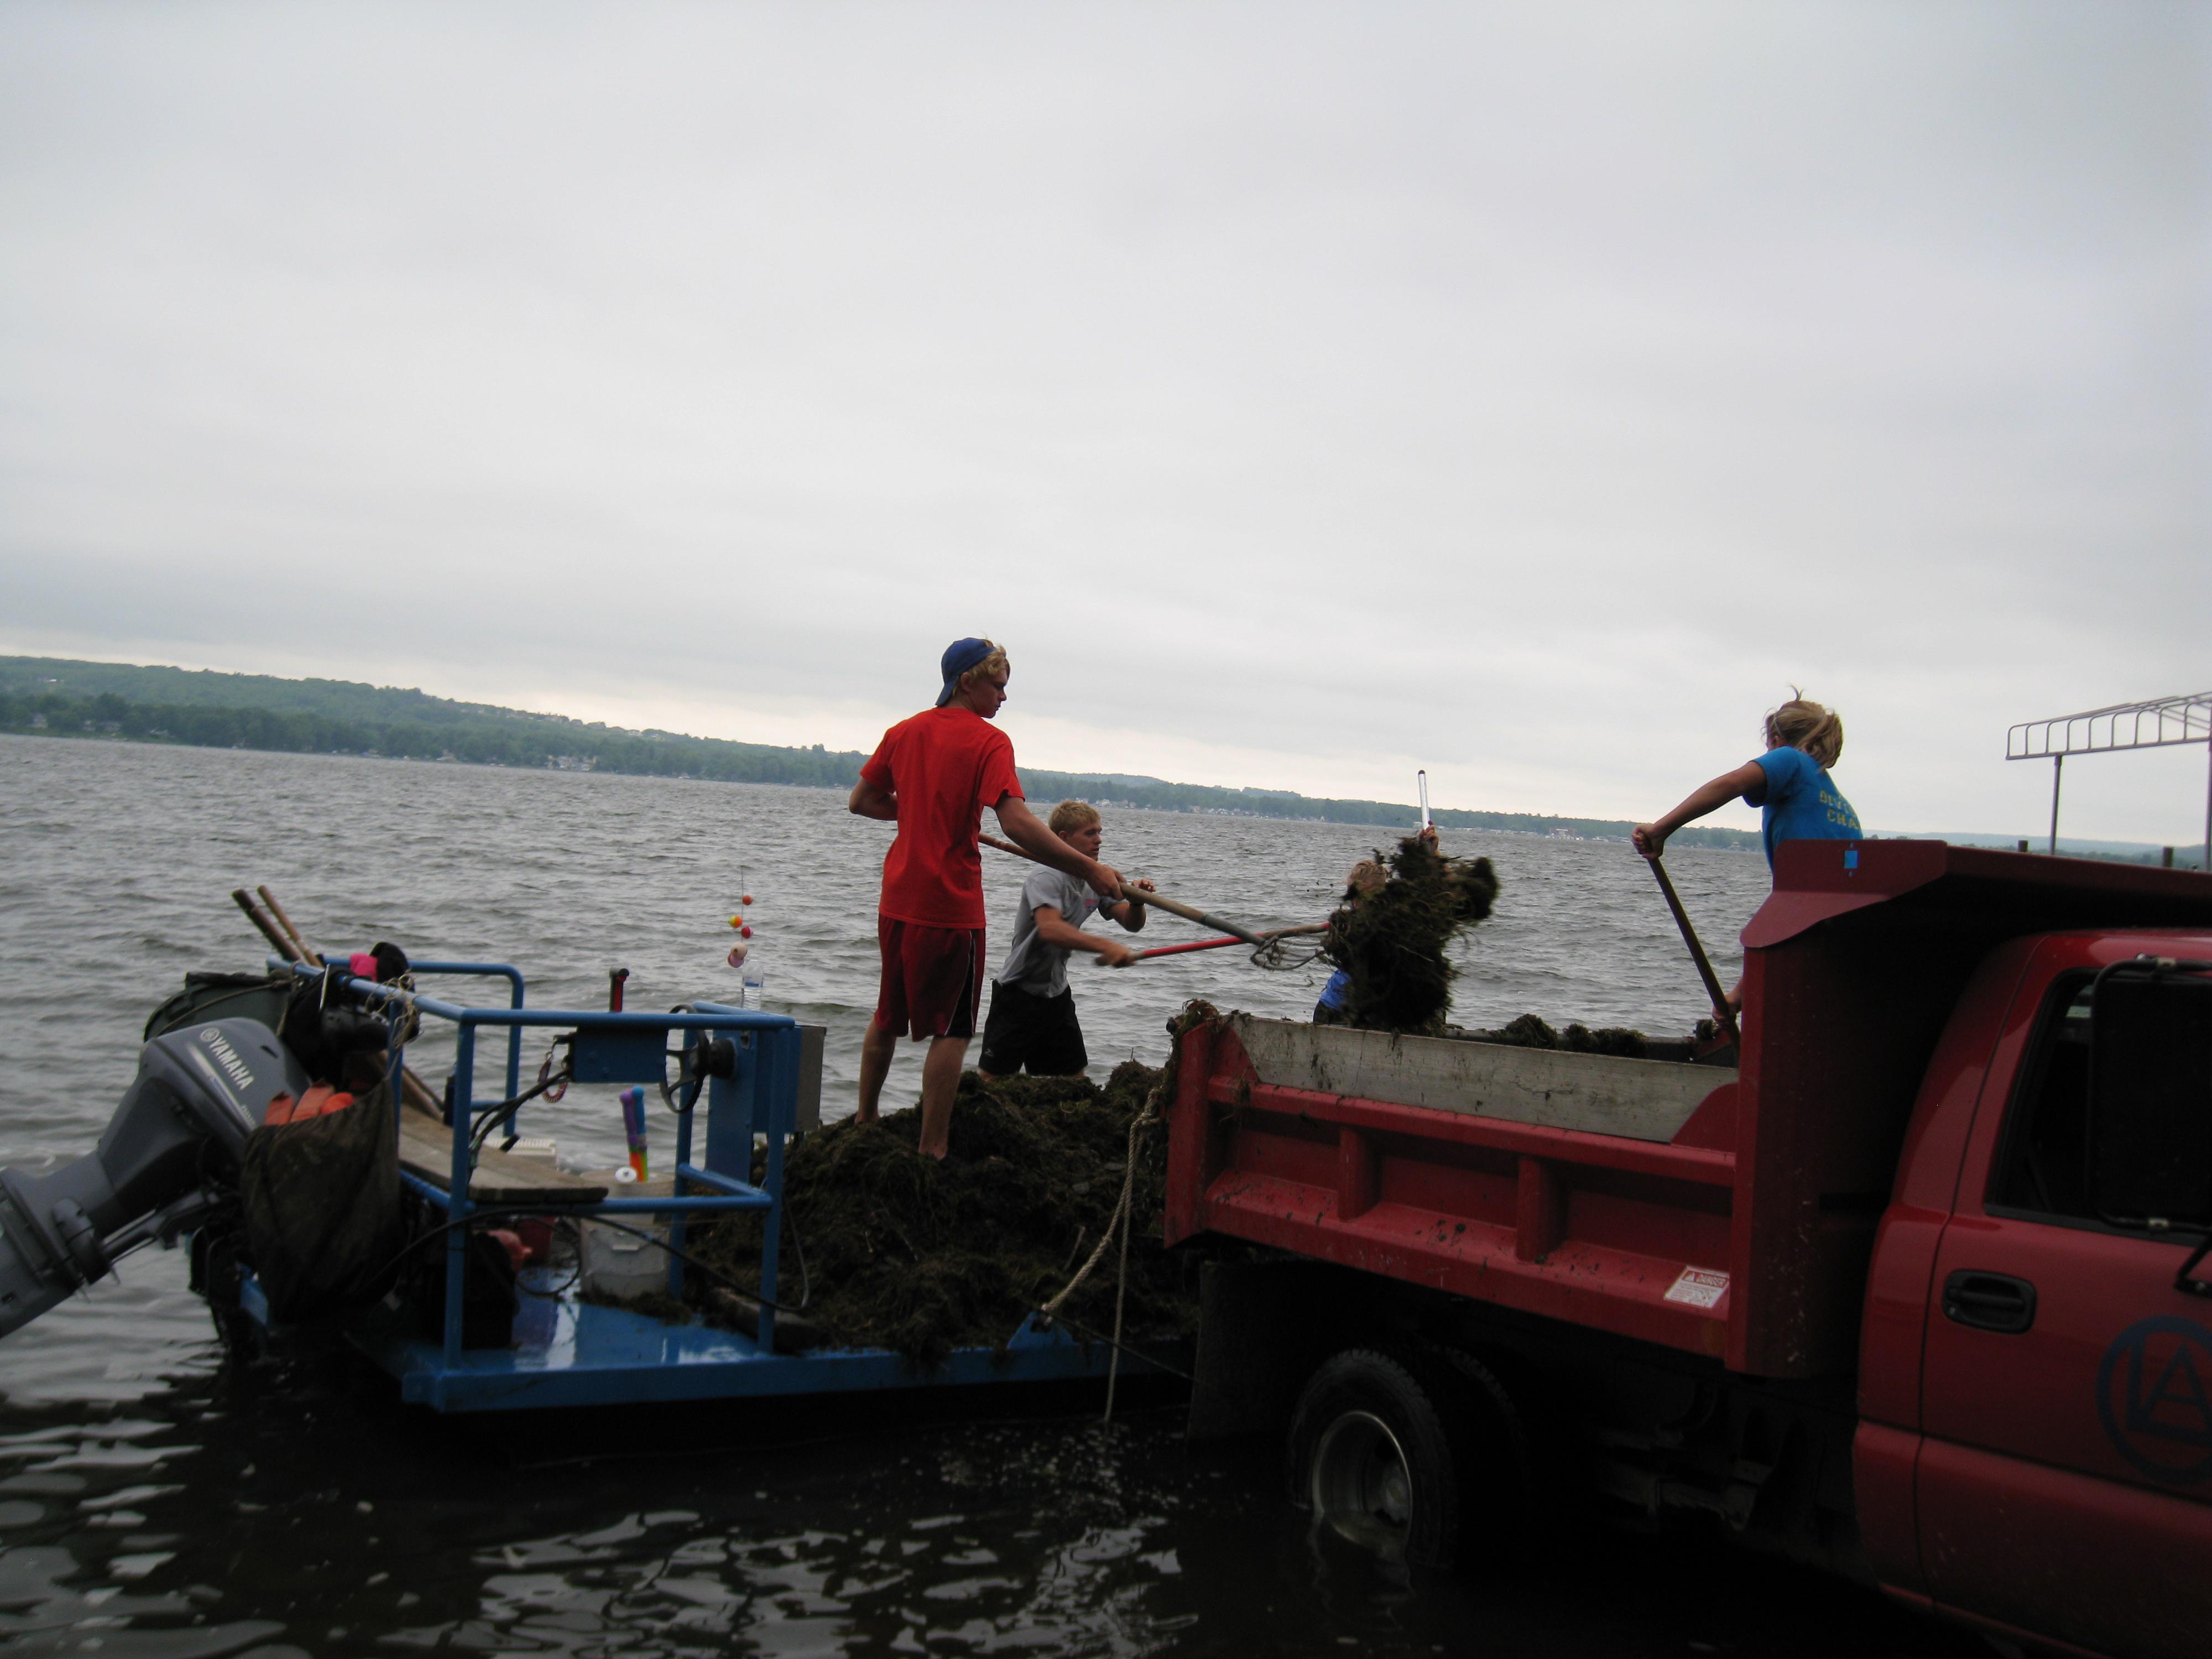 Chautauqua Lake Association Ends Summer Harvest Season